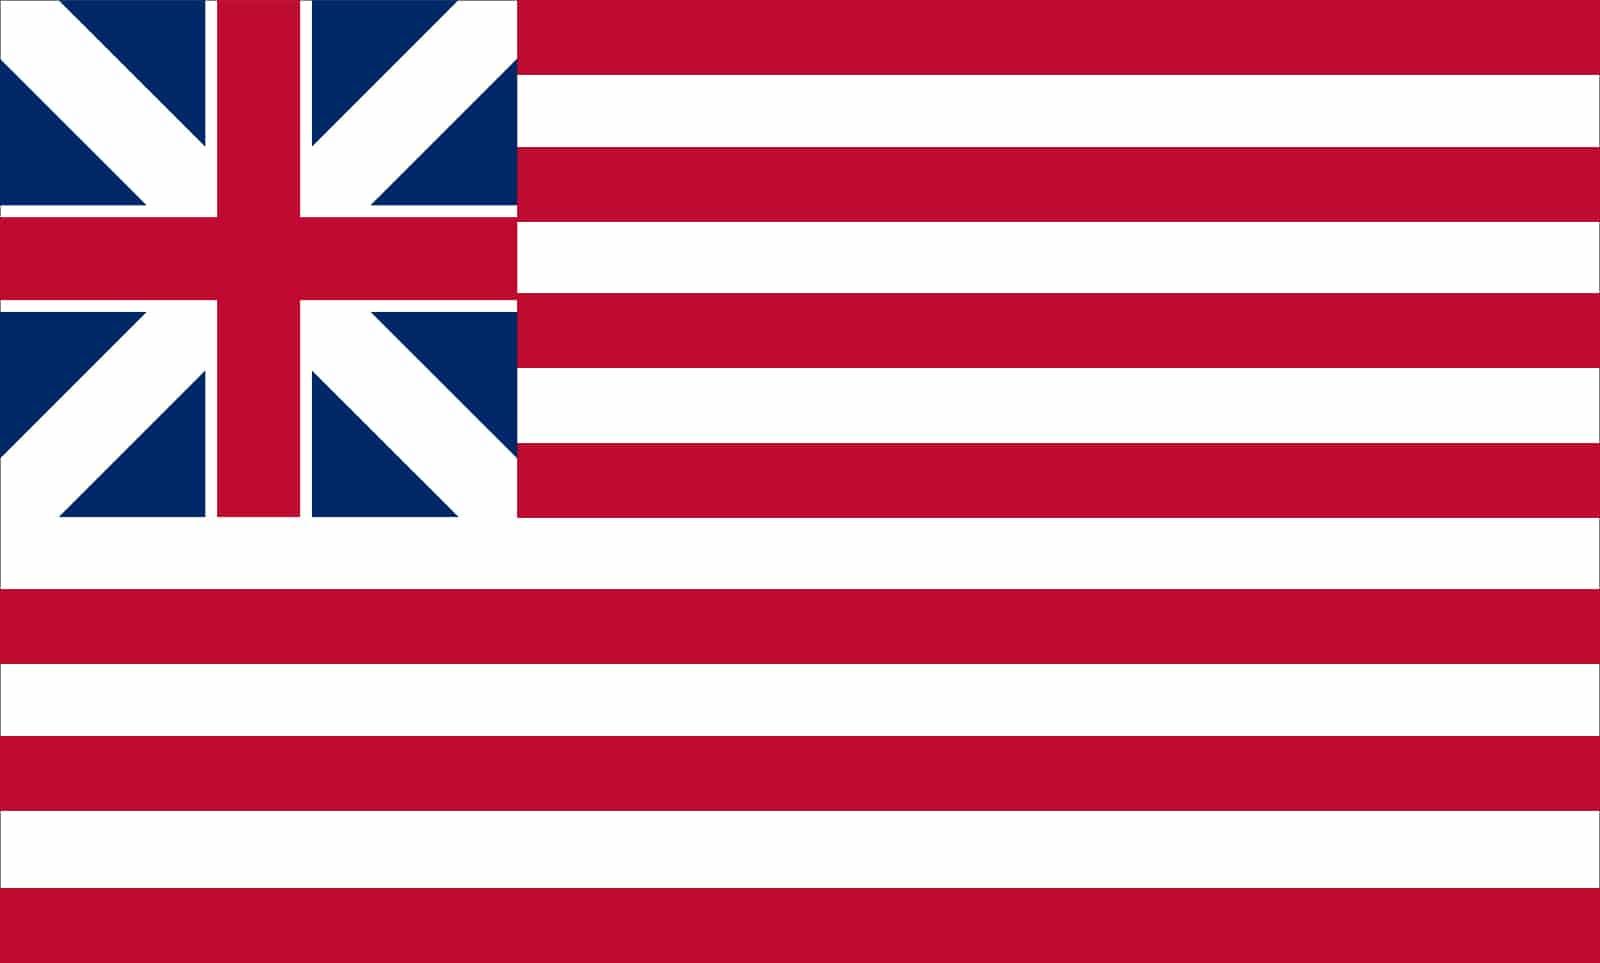 Ribbon Blender Manufacturer, Supplier and Exporter in America